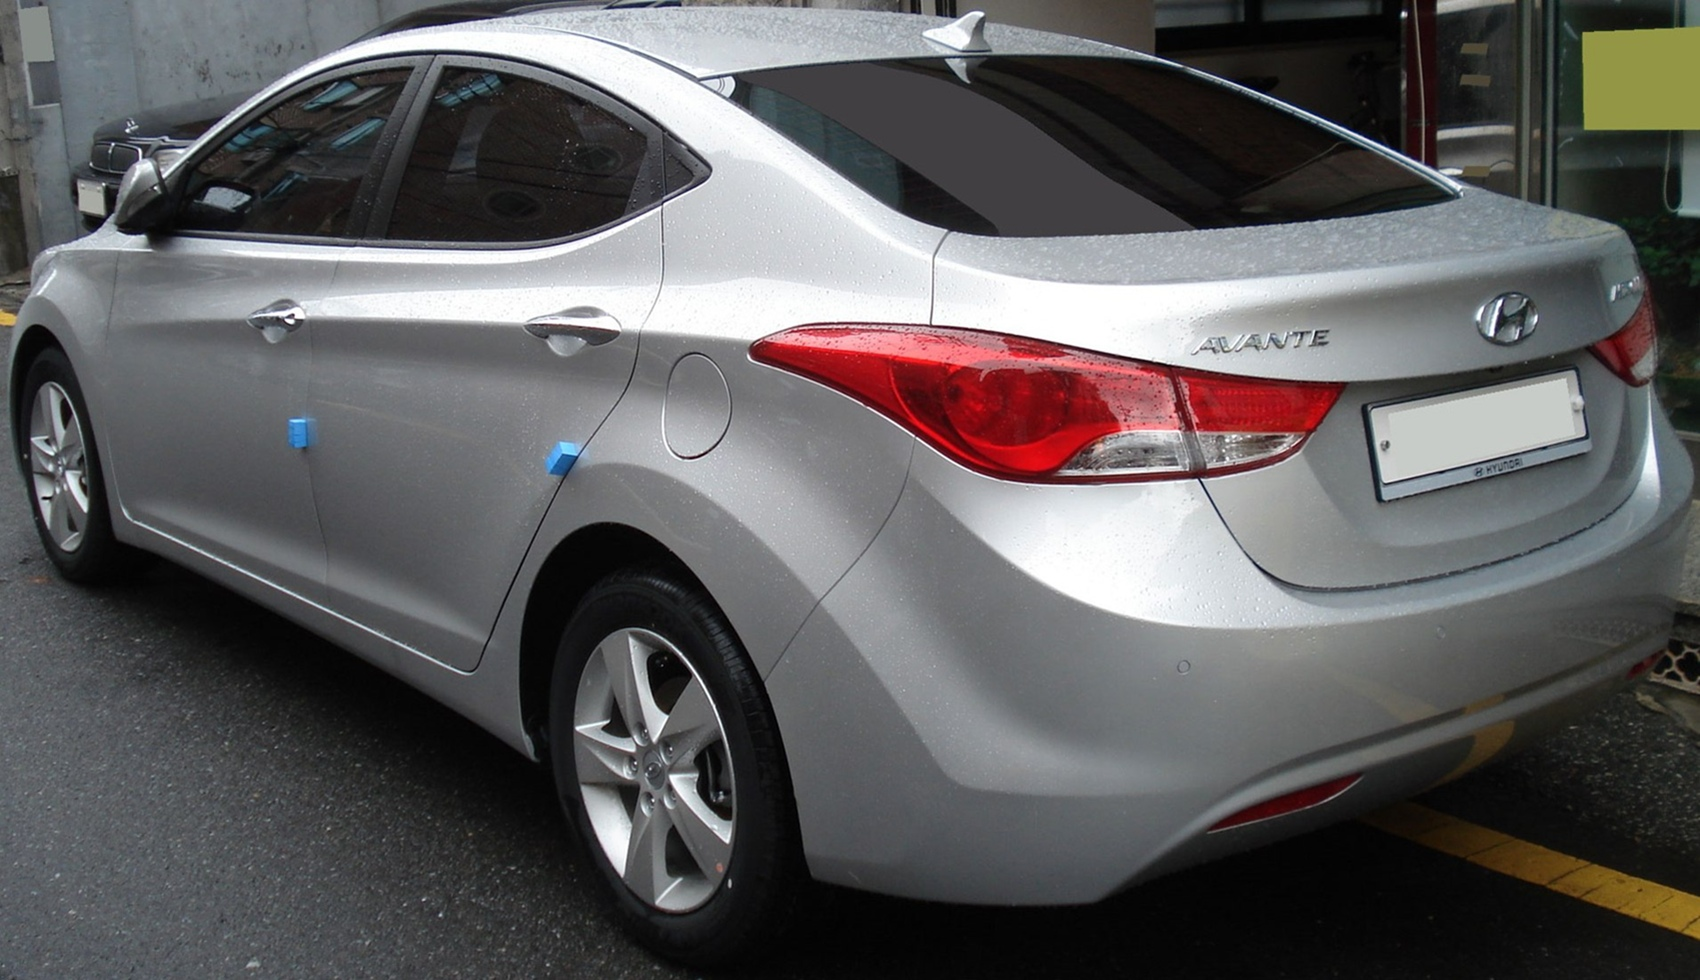 Hyundai Elantra - это... Что такое Hyundai Elantra?